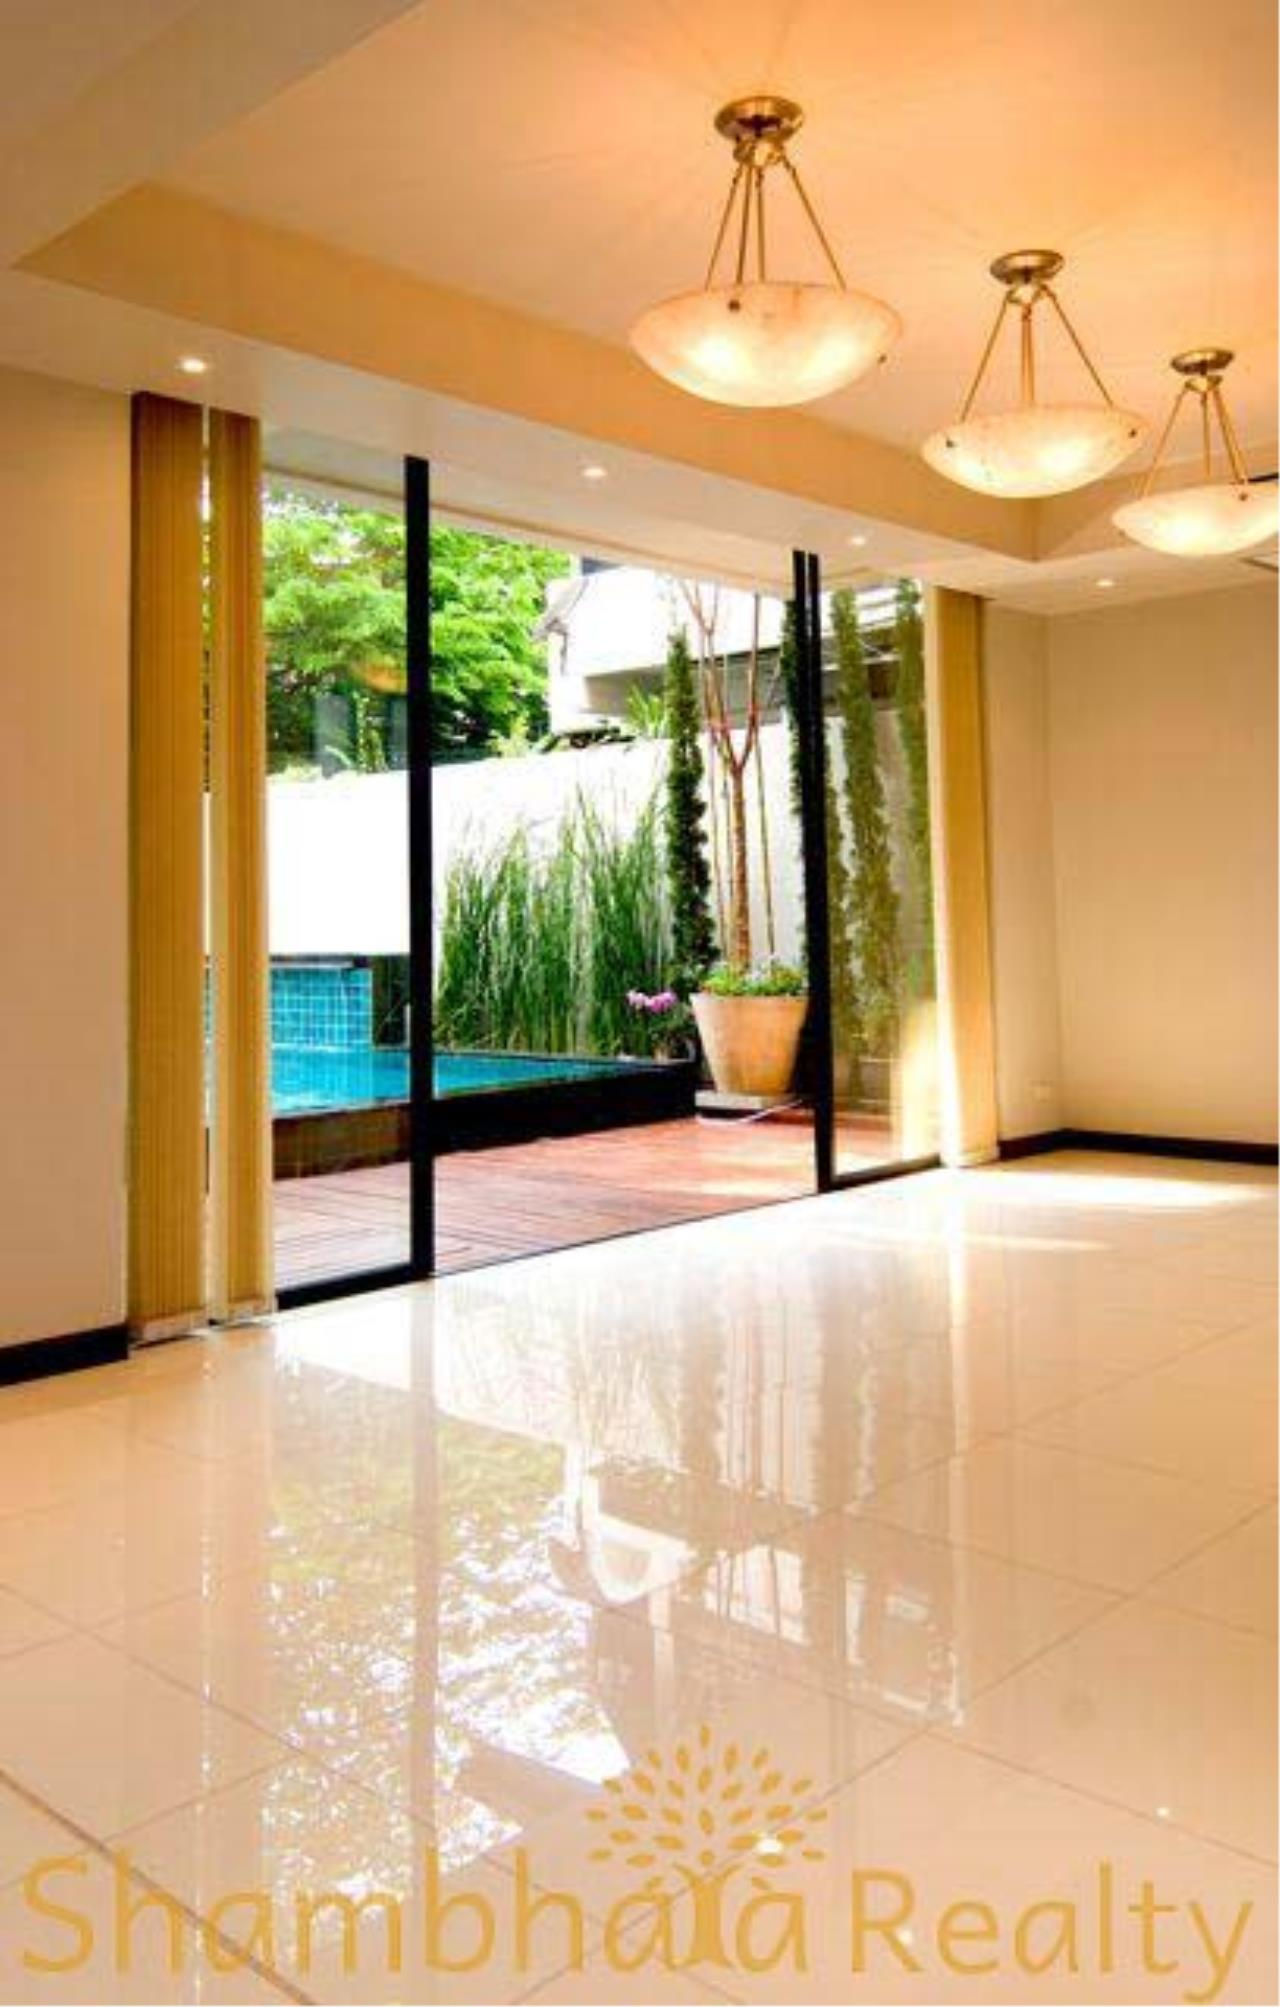 Shambhala Realty Agency's House for rent at Sukhumvit 34 Condominium for Rent in Sukhumvit 34 4